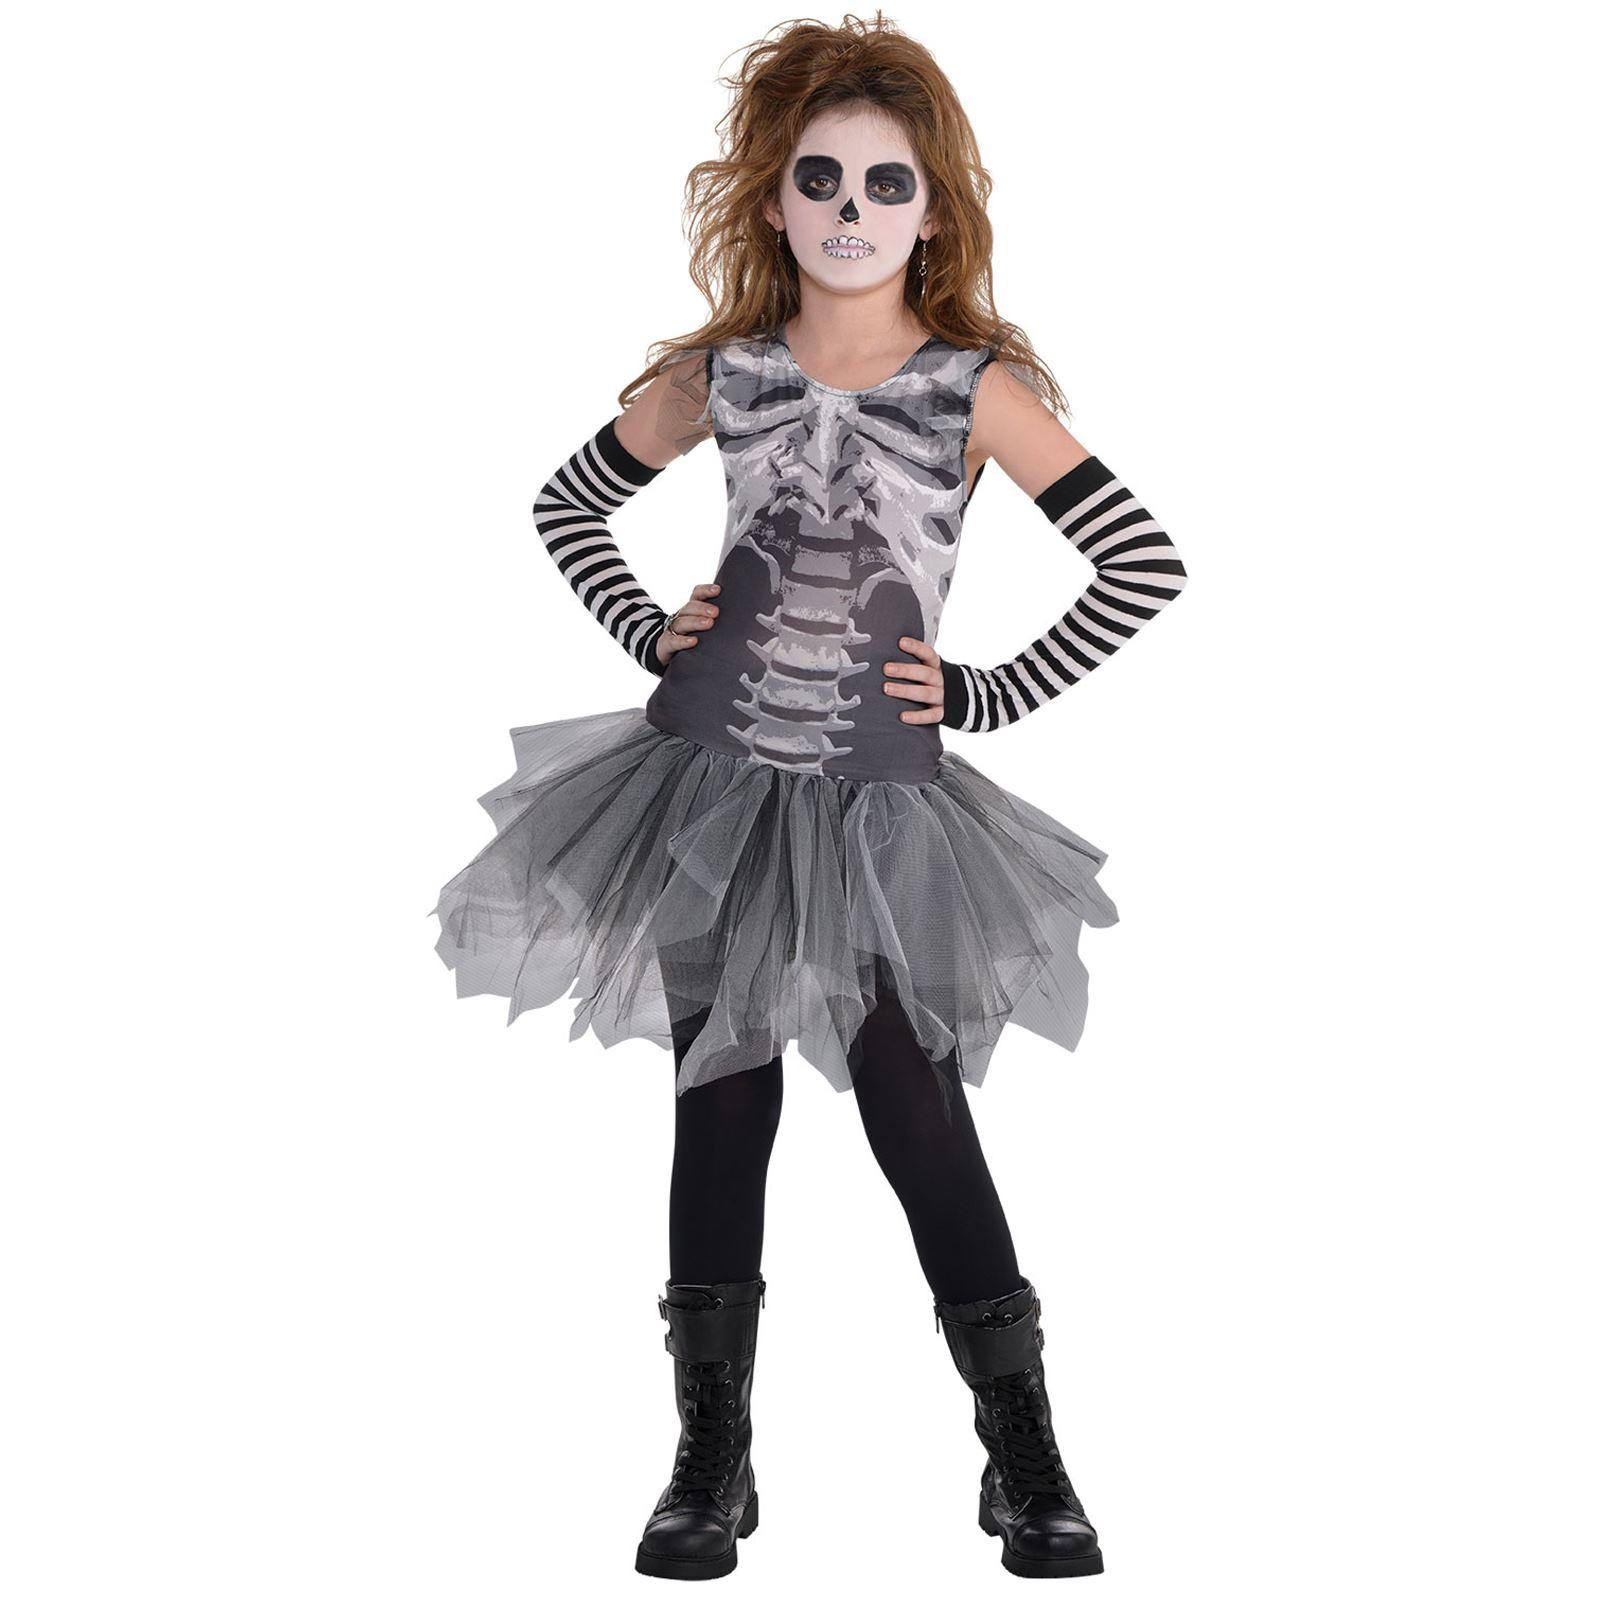 fb377b1fc0577 Kids Girls Black & Bone Skeleton Tutu Dress Leggings Halloween ...